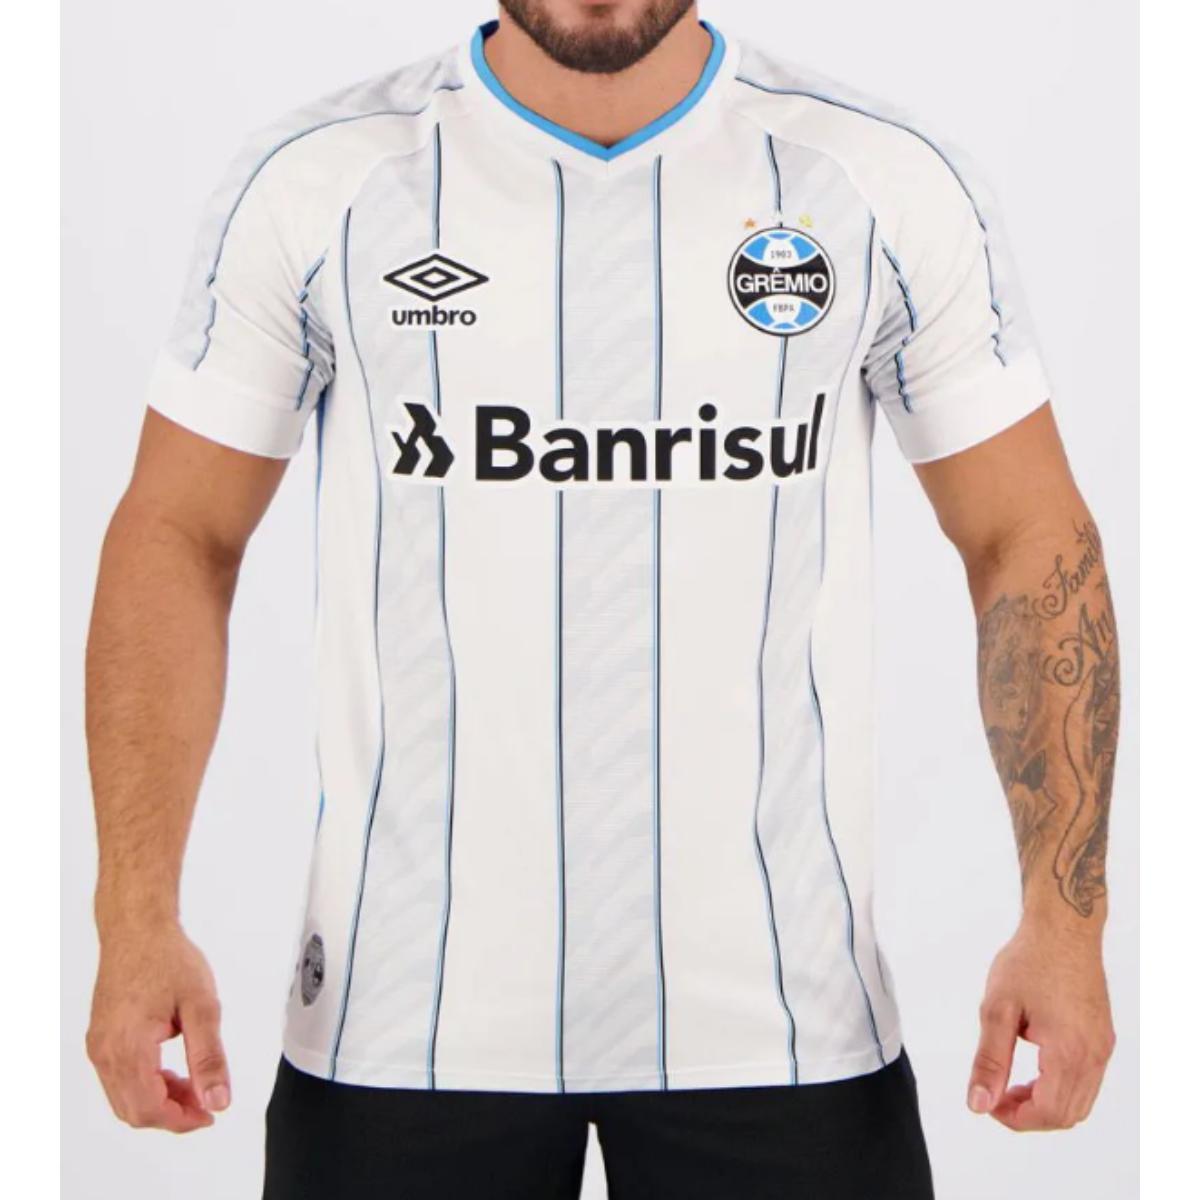 Camiseta Masculina Grêmio 3g161207 Of.2 2020 Classic C/n 11 Branco/azul/preto